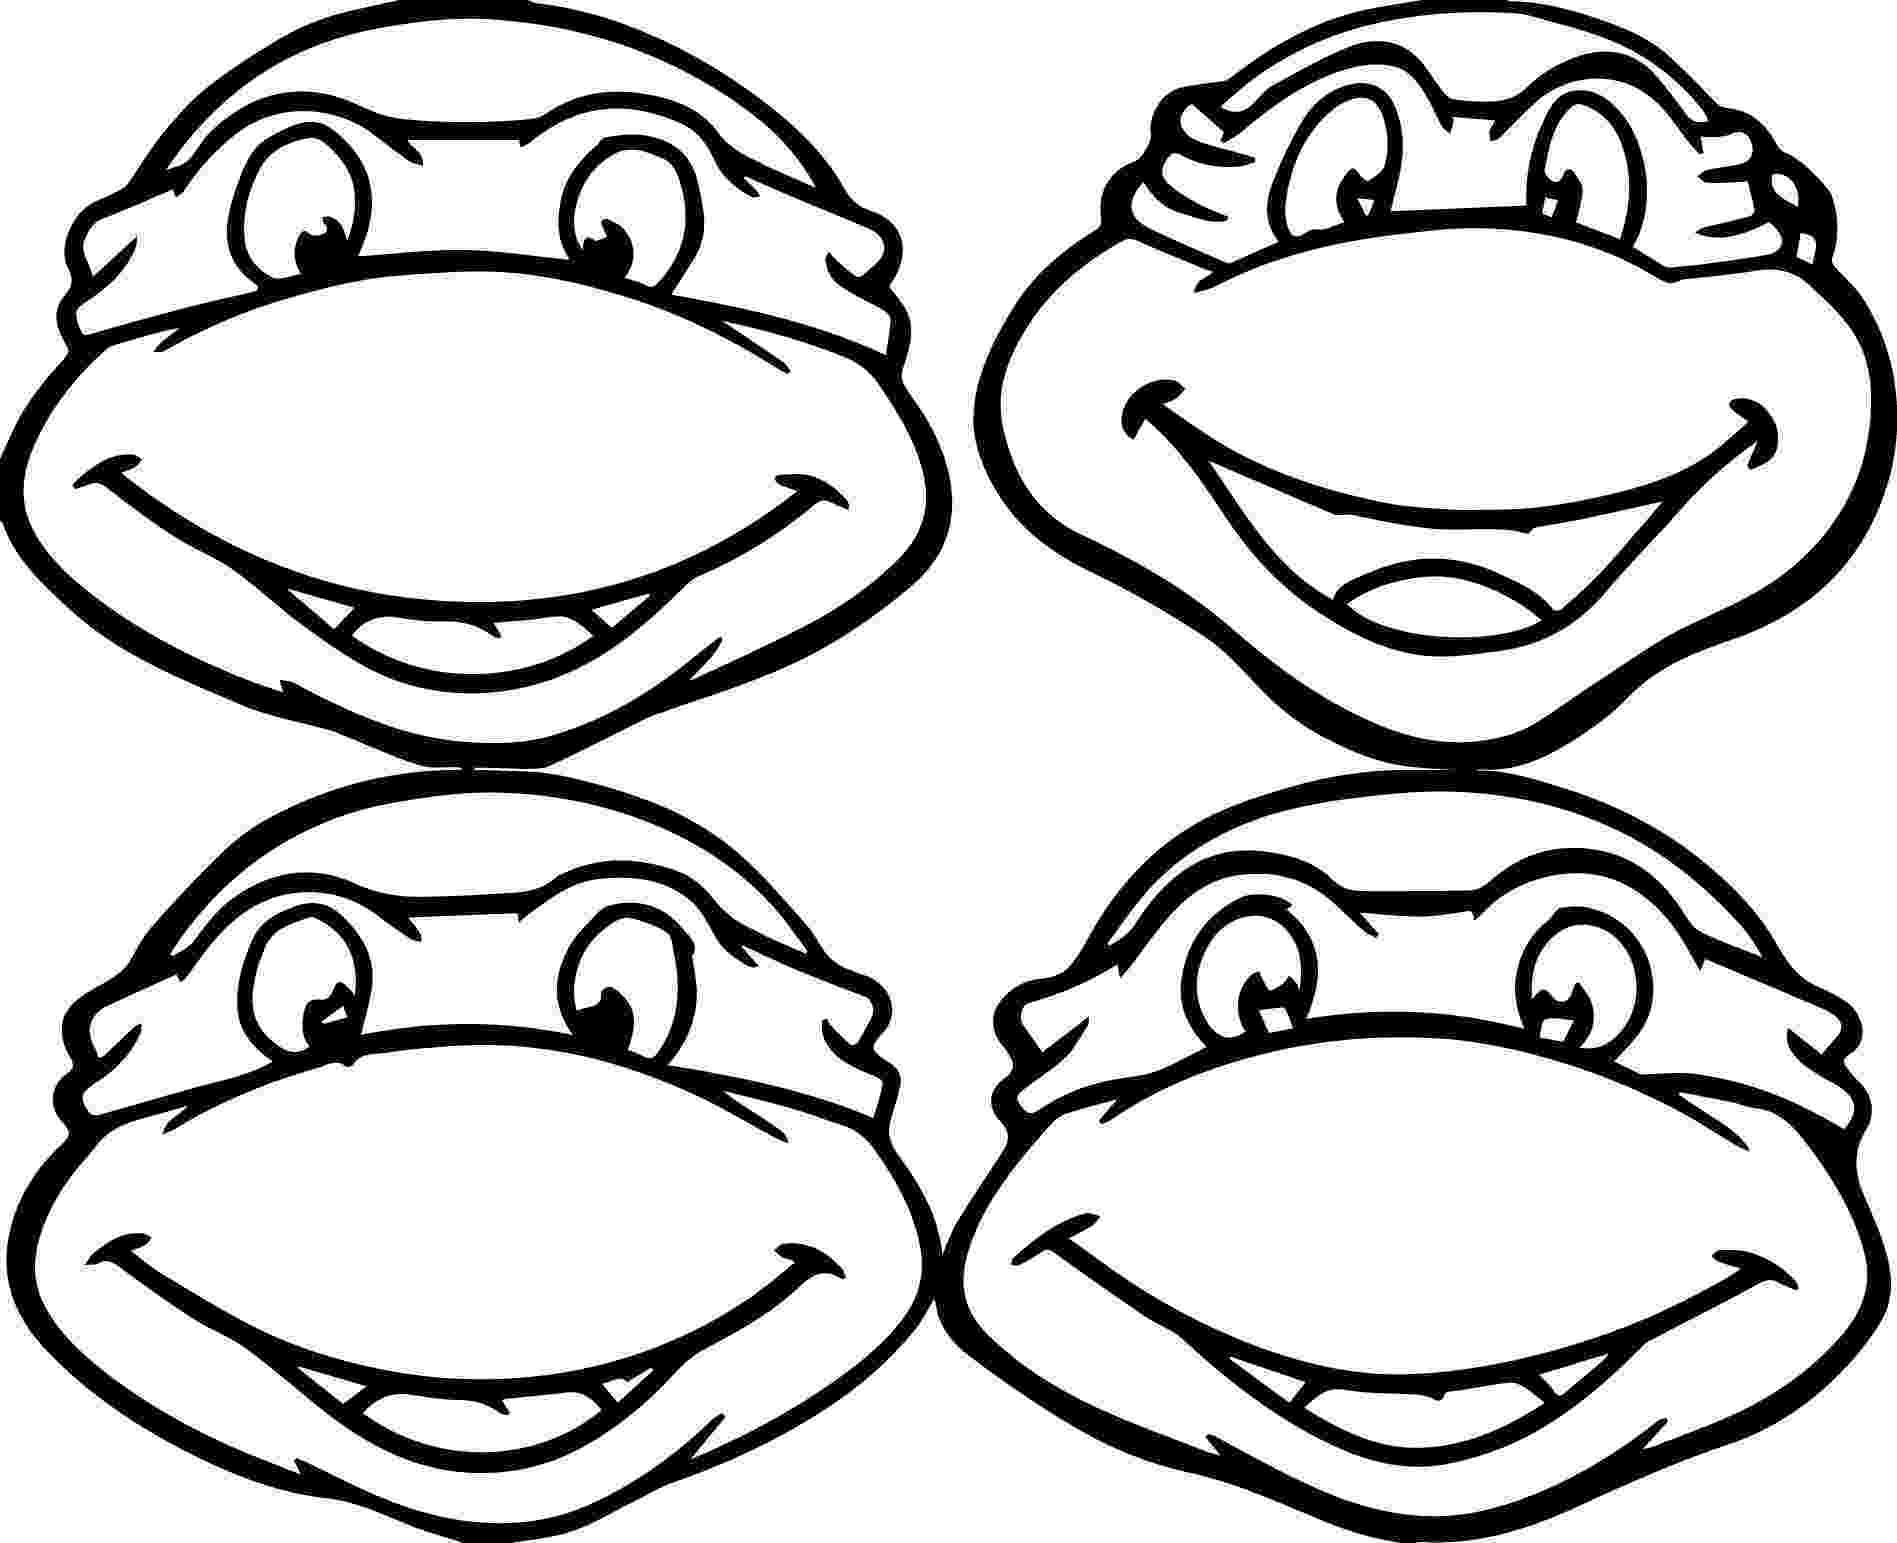 free printable coloring pages ninja turtles sara dunkerton illustration and animation teenage mutant free coloring printable ninja pages turtles